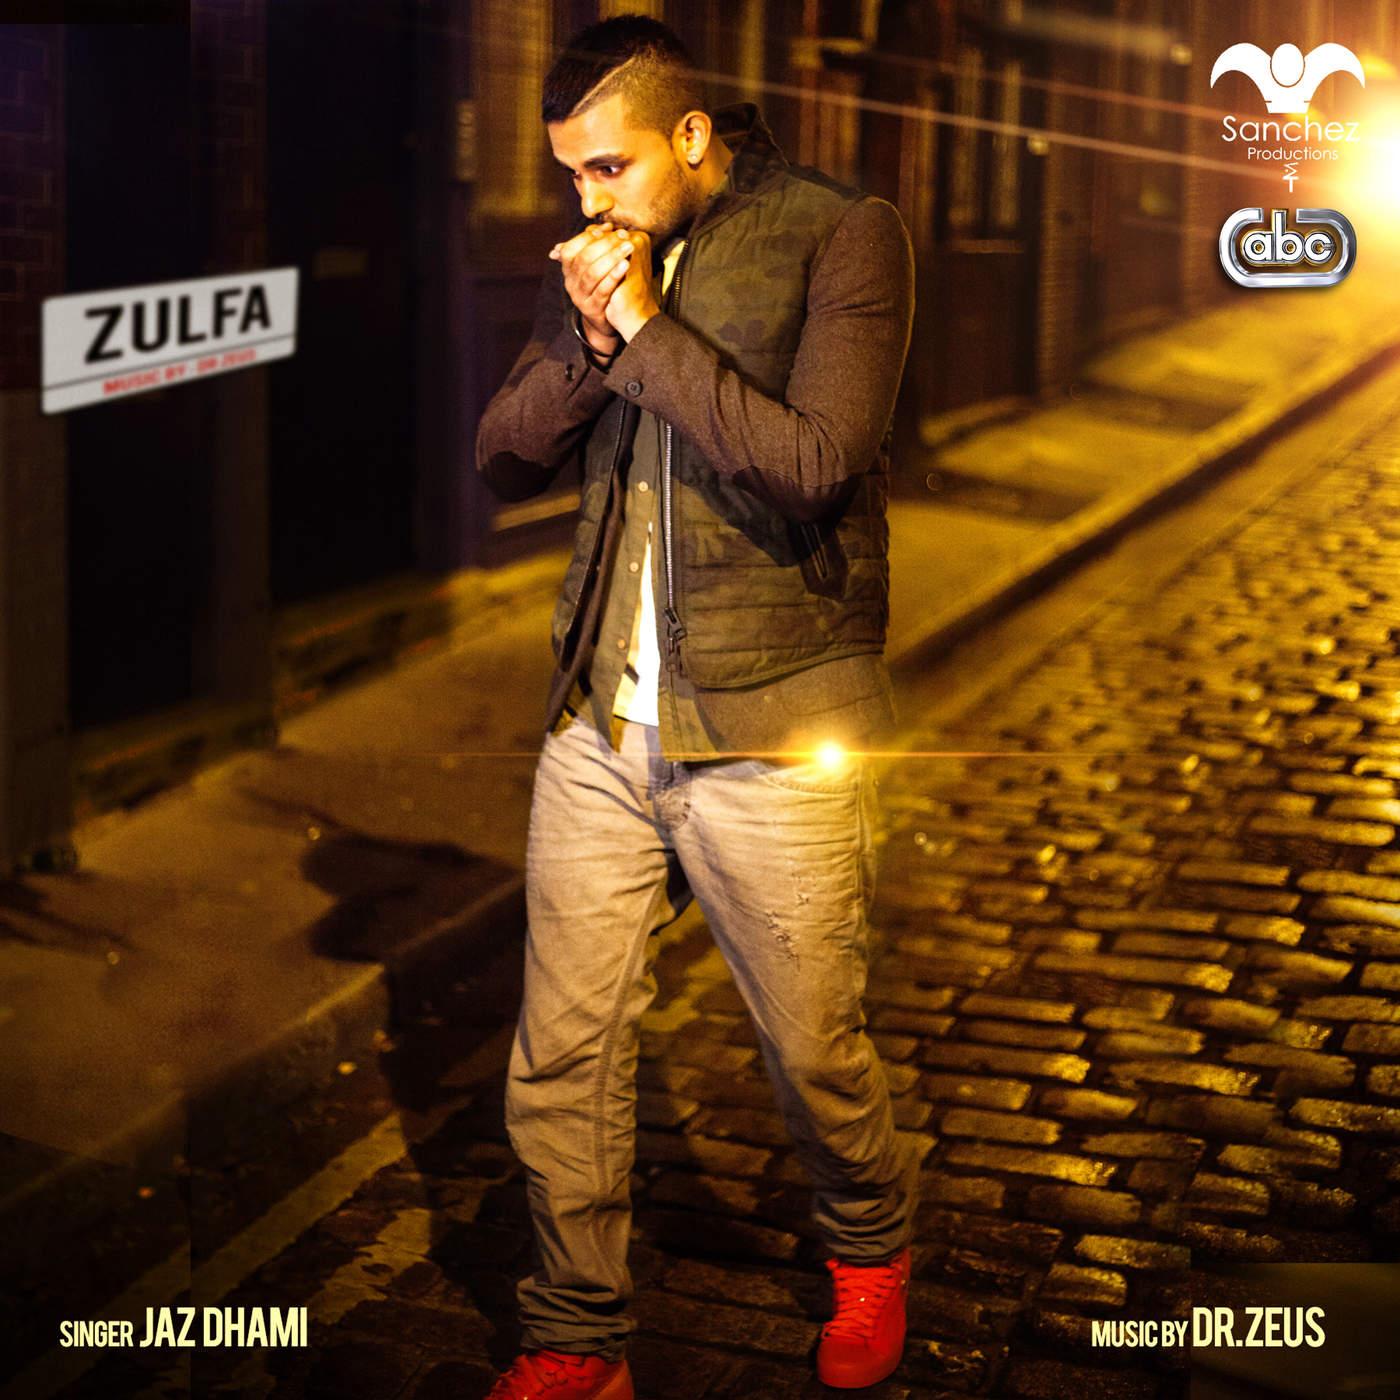 Jaz Dhami - Zulfa (feat. Dr. Zeus, Shortie, Fateh & Yasmine) - Single Cover